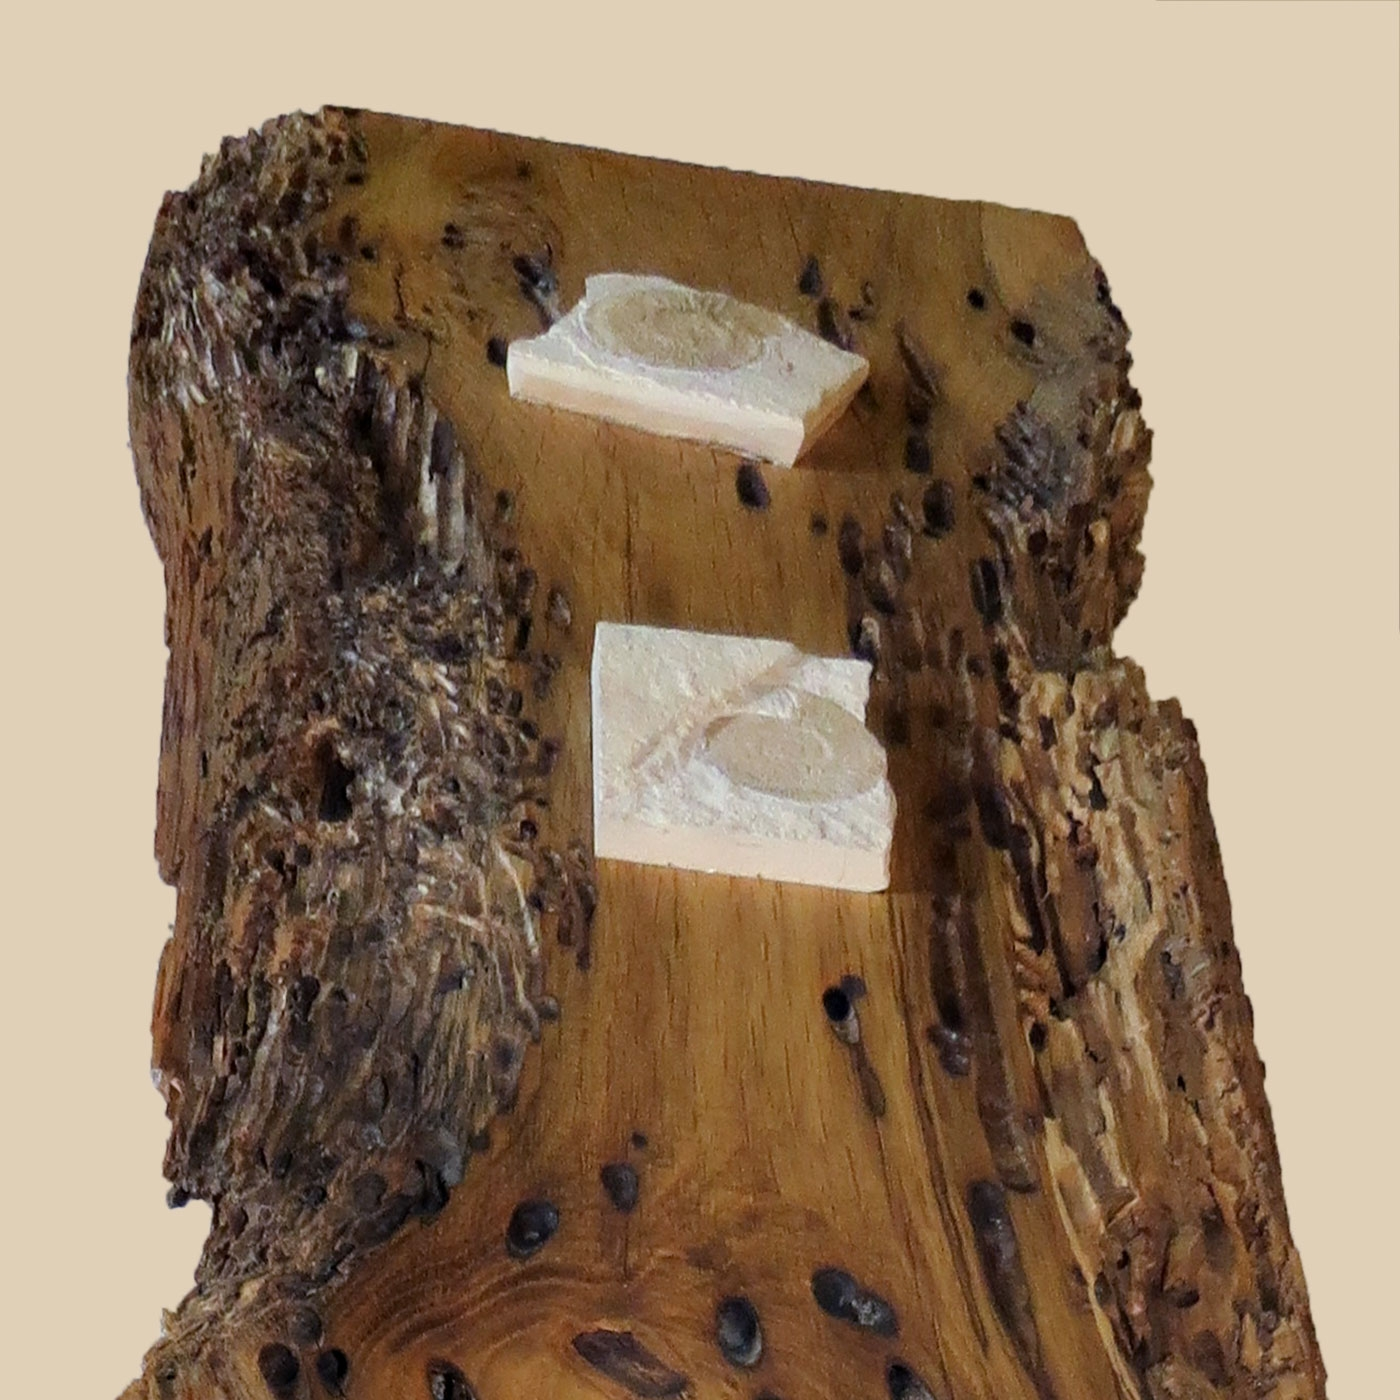 Fossilien auf Briccole-Venedigholz